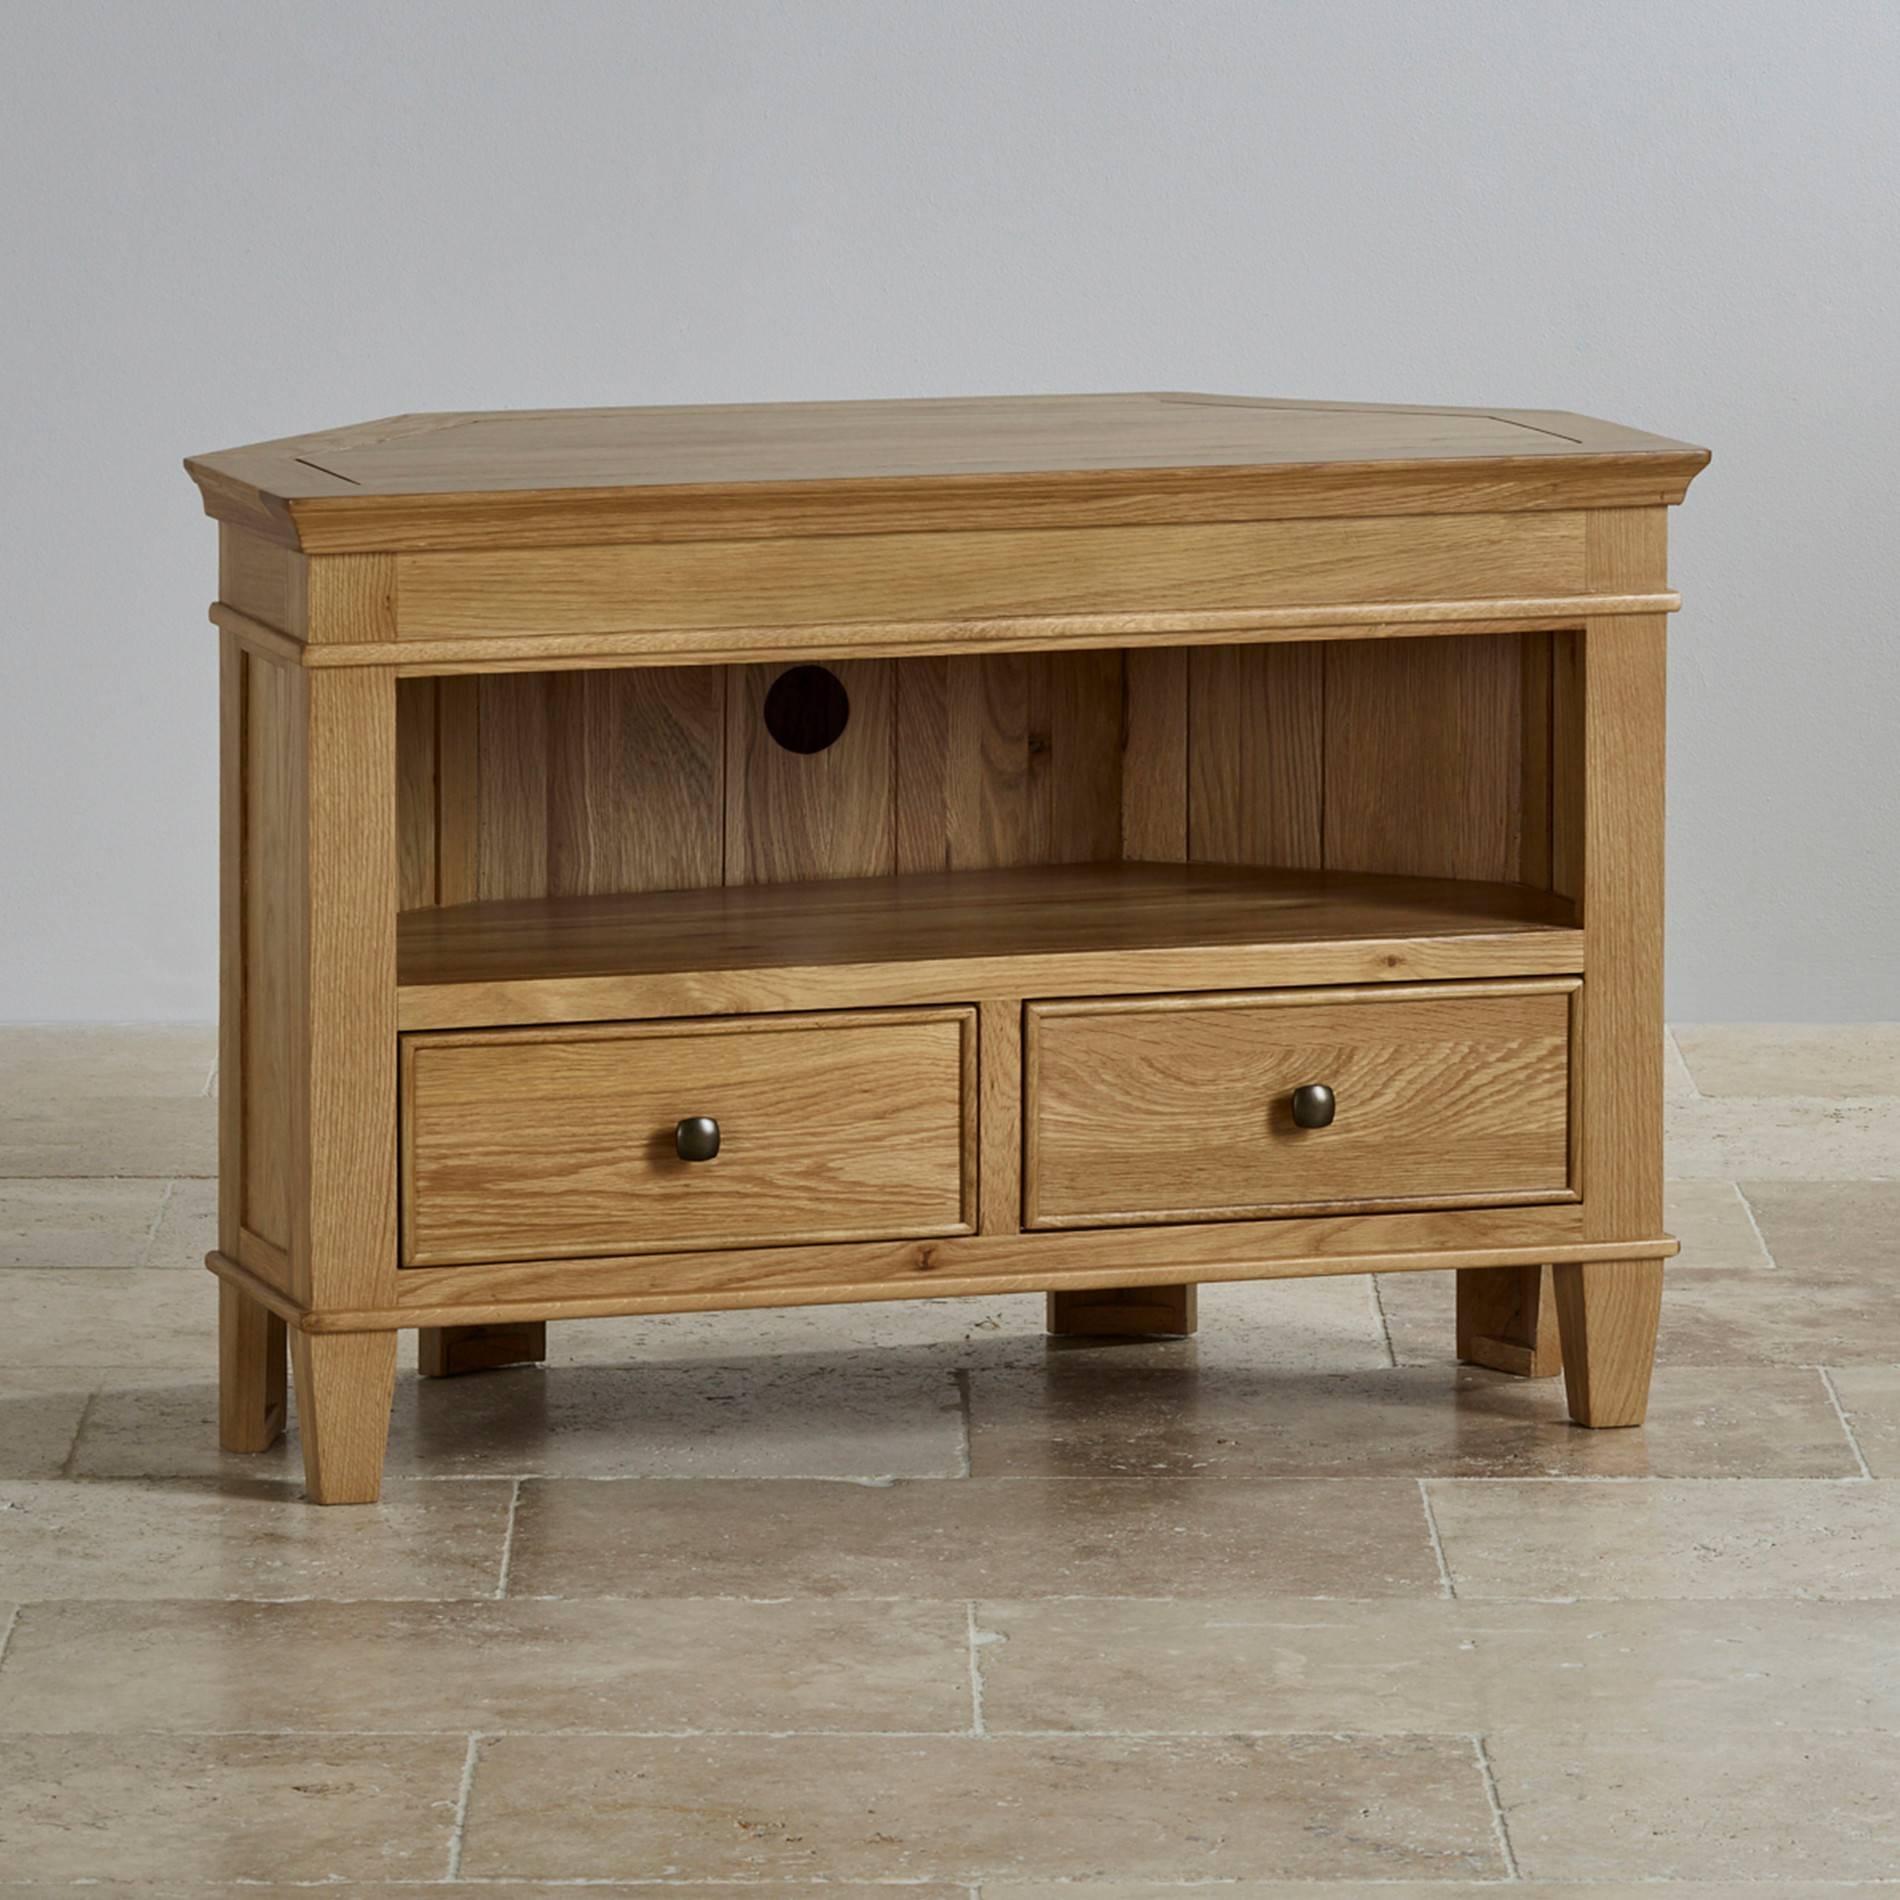 Classic Corner Tv Cabinet In Solid Oak | Oak Furniture Land within Solid Oak Corner Tv Cabinets (Image 4 of 15)